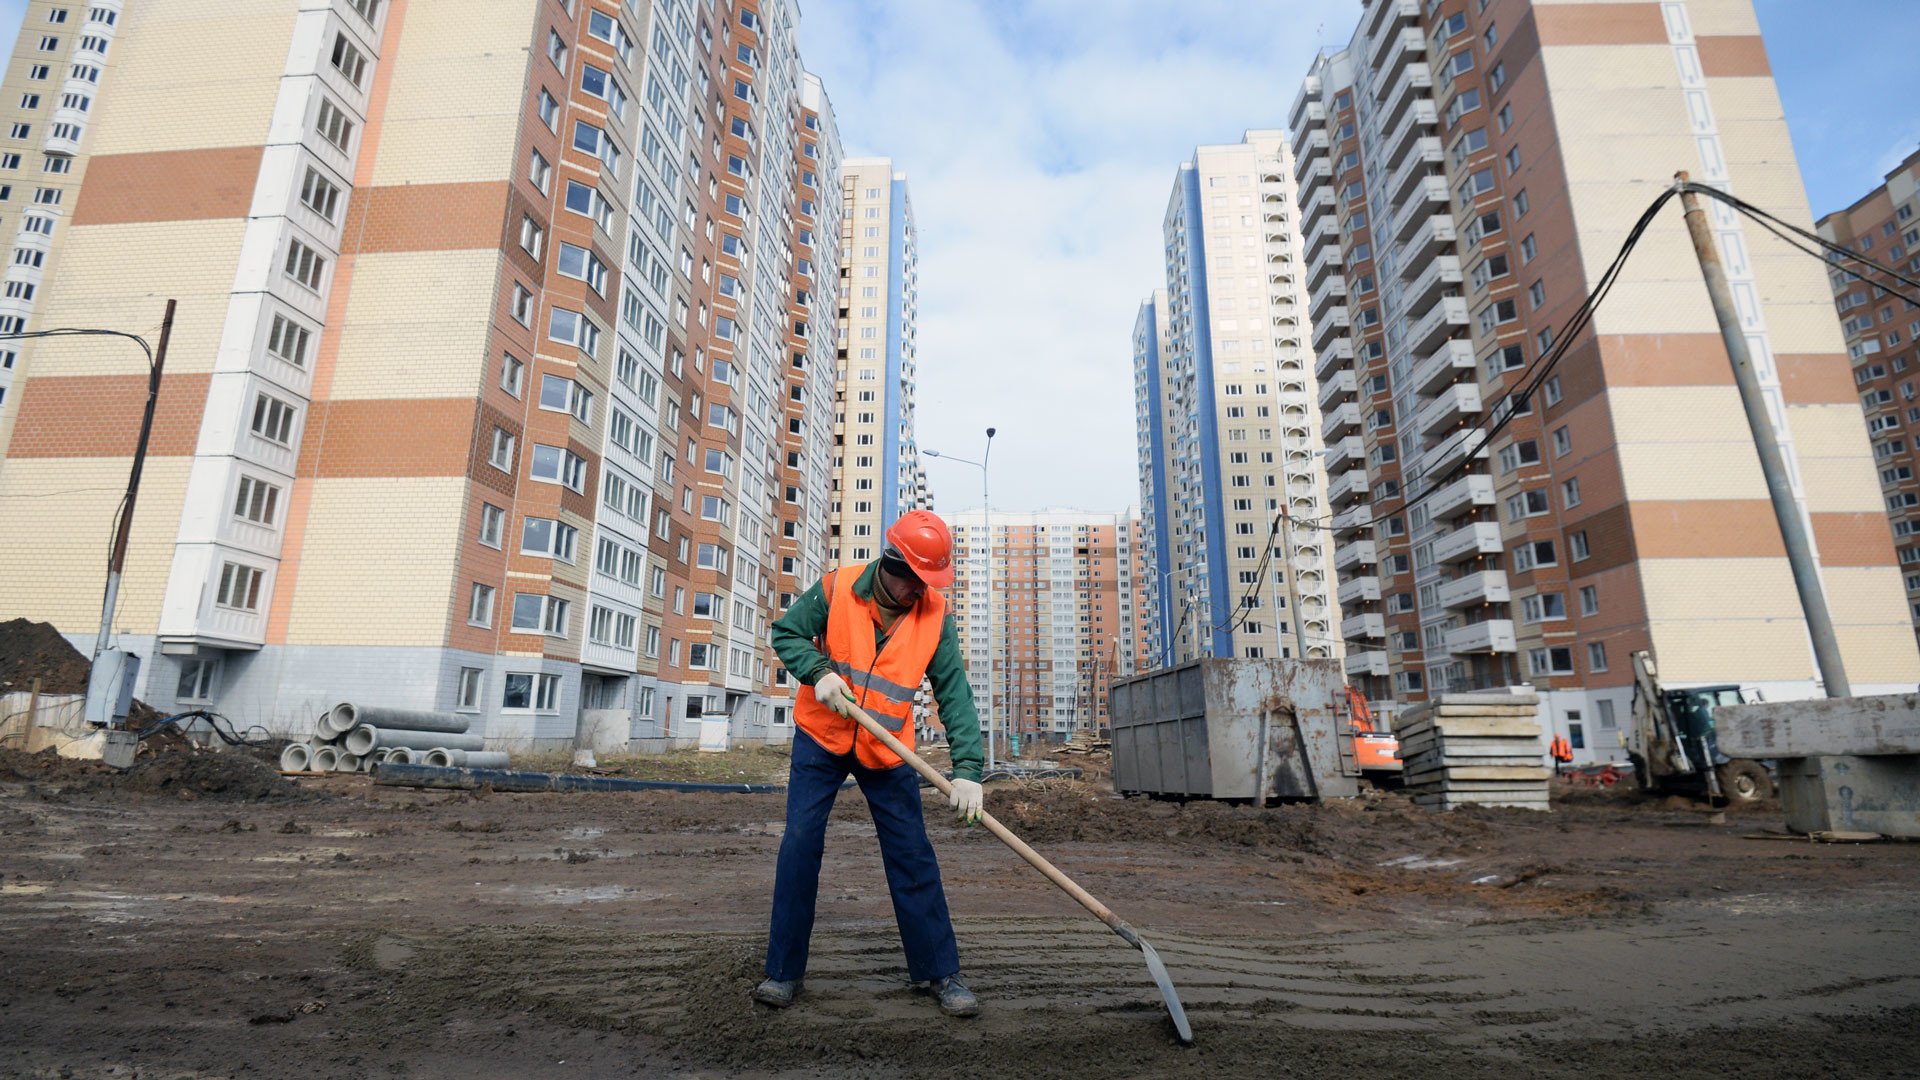 <p>Фото: &copy;&nbsp;РИА Новости/Алексей Филиппов</p>